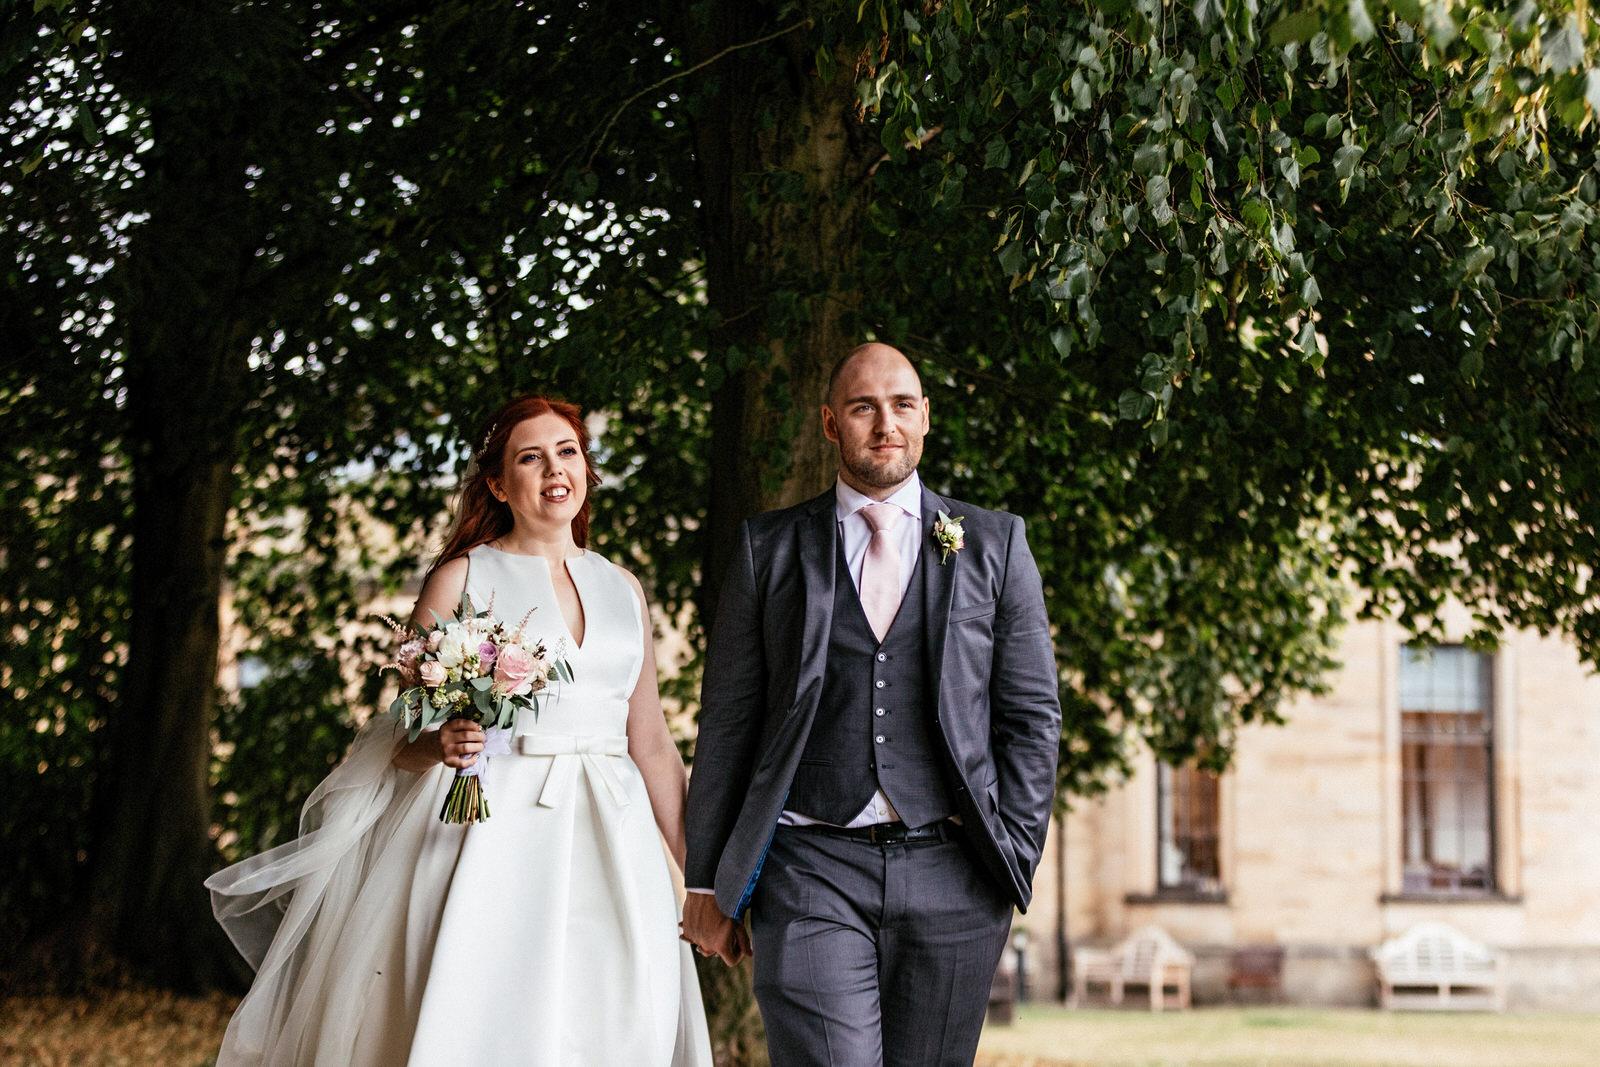 Beamish-Hall-Wedding-Photographer-047.jpg